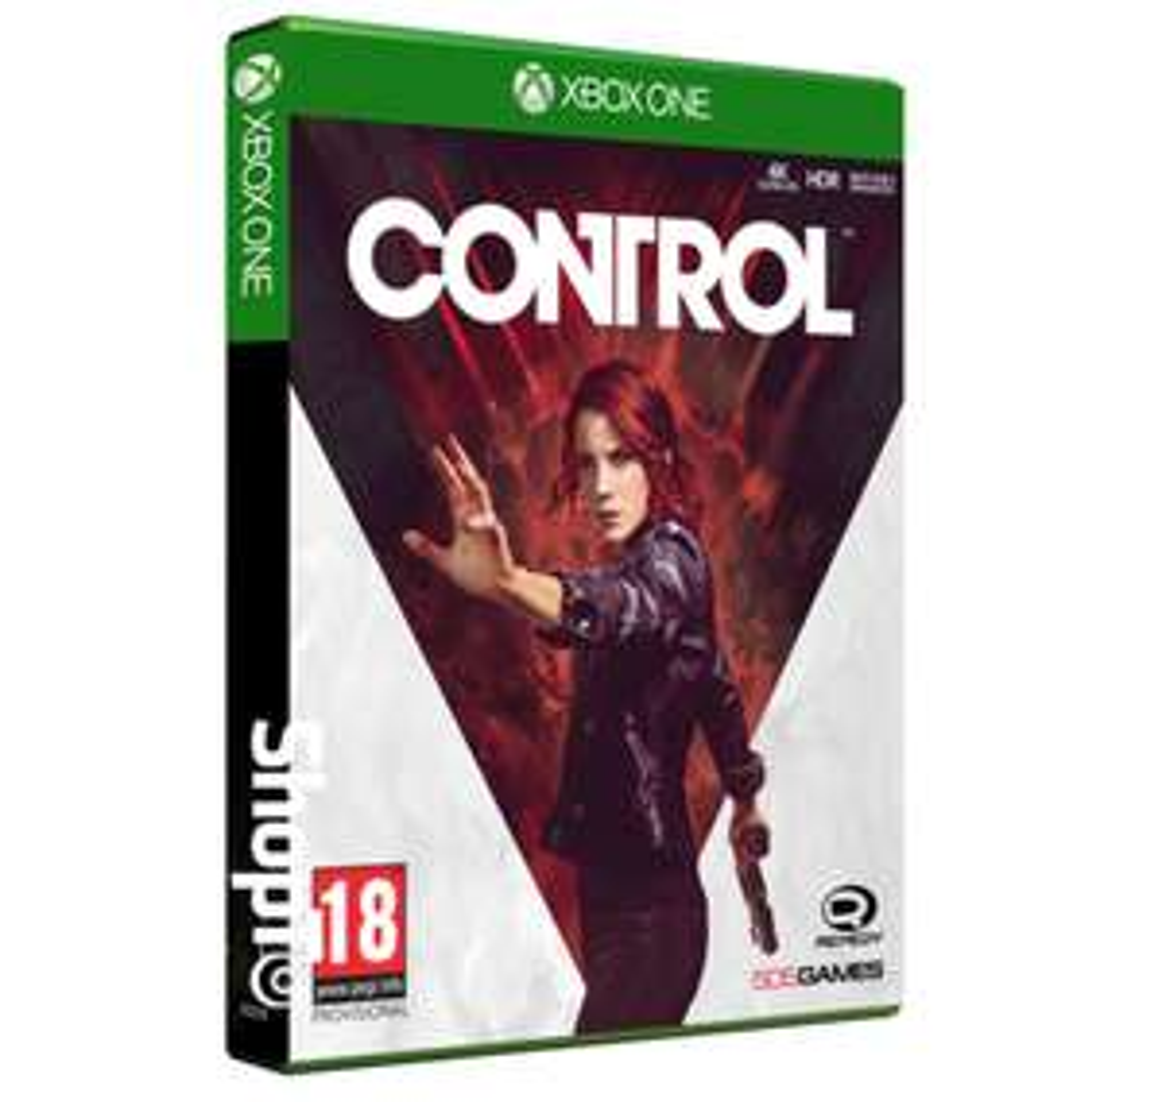 Control (Game) + Free T Shirt Xbox One Pre order - £39.85 @ ShopTo